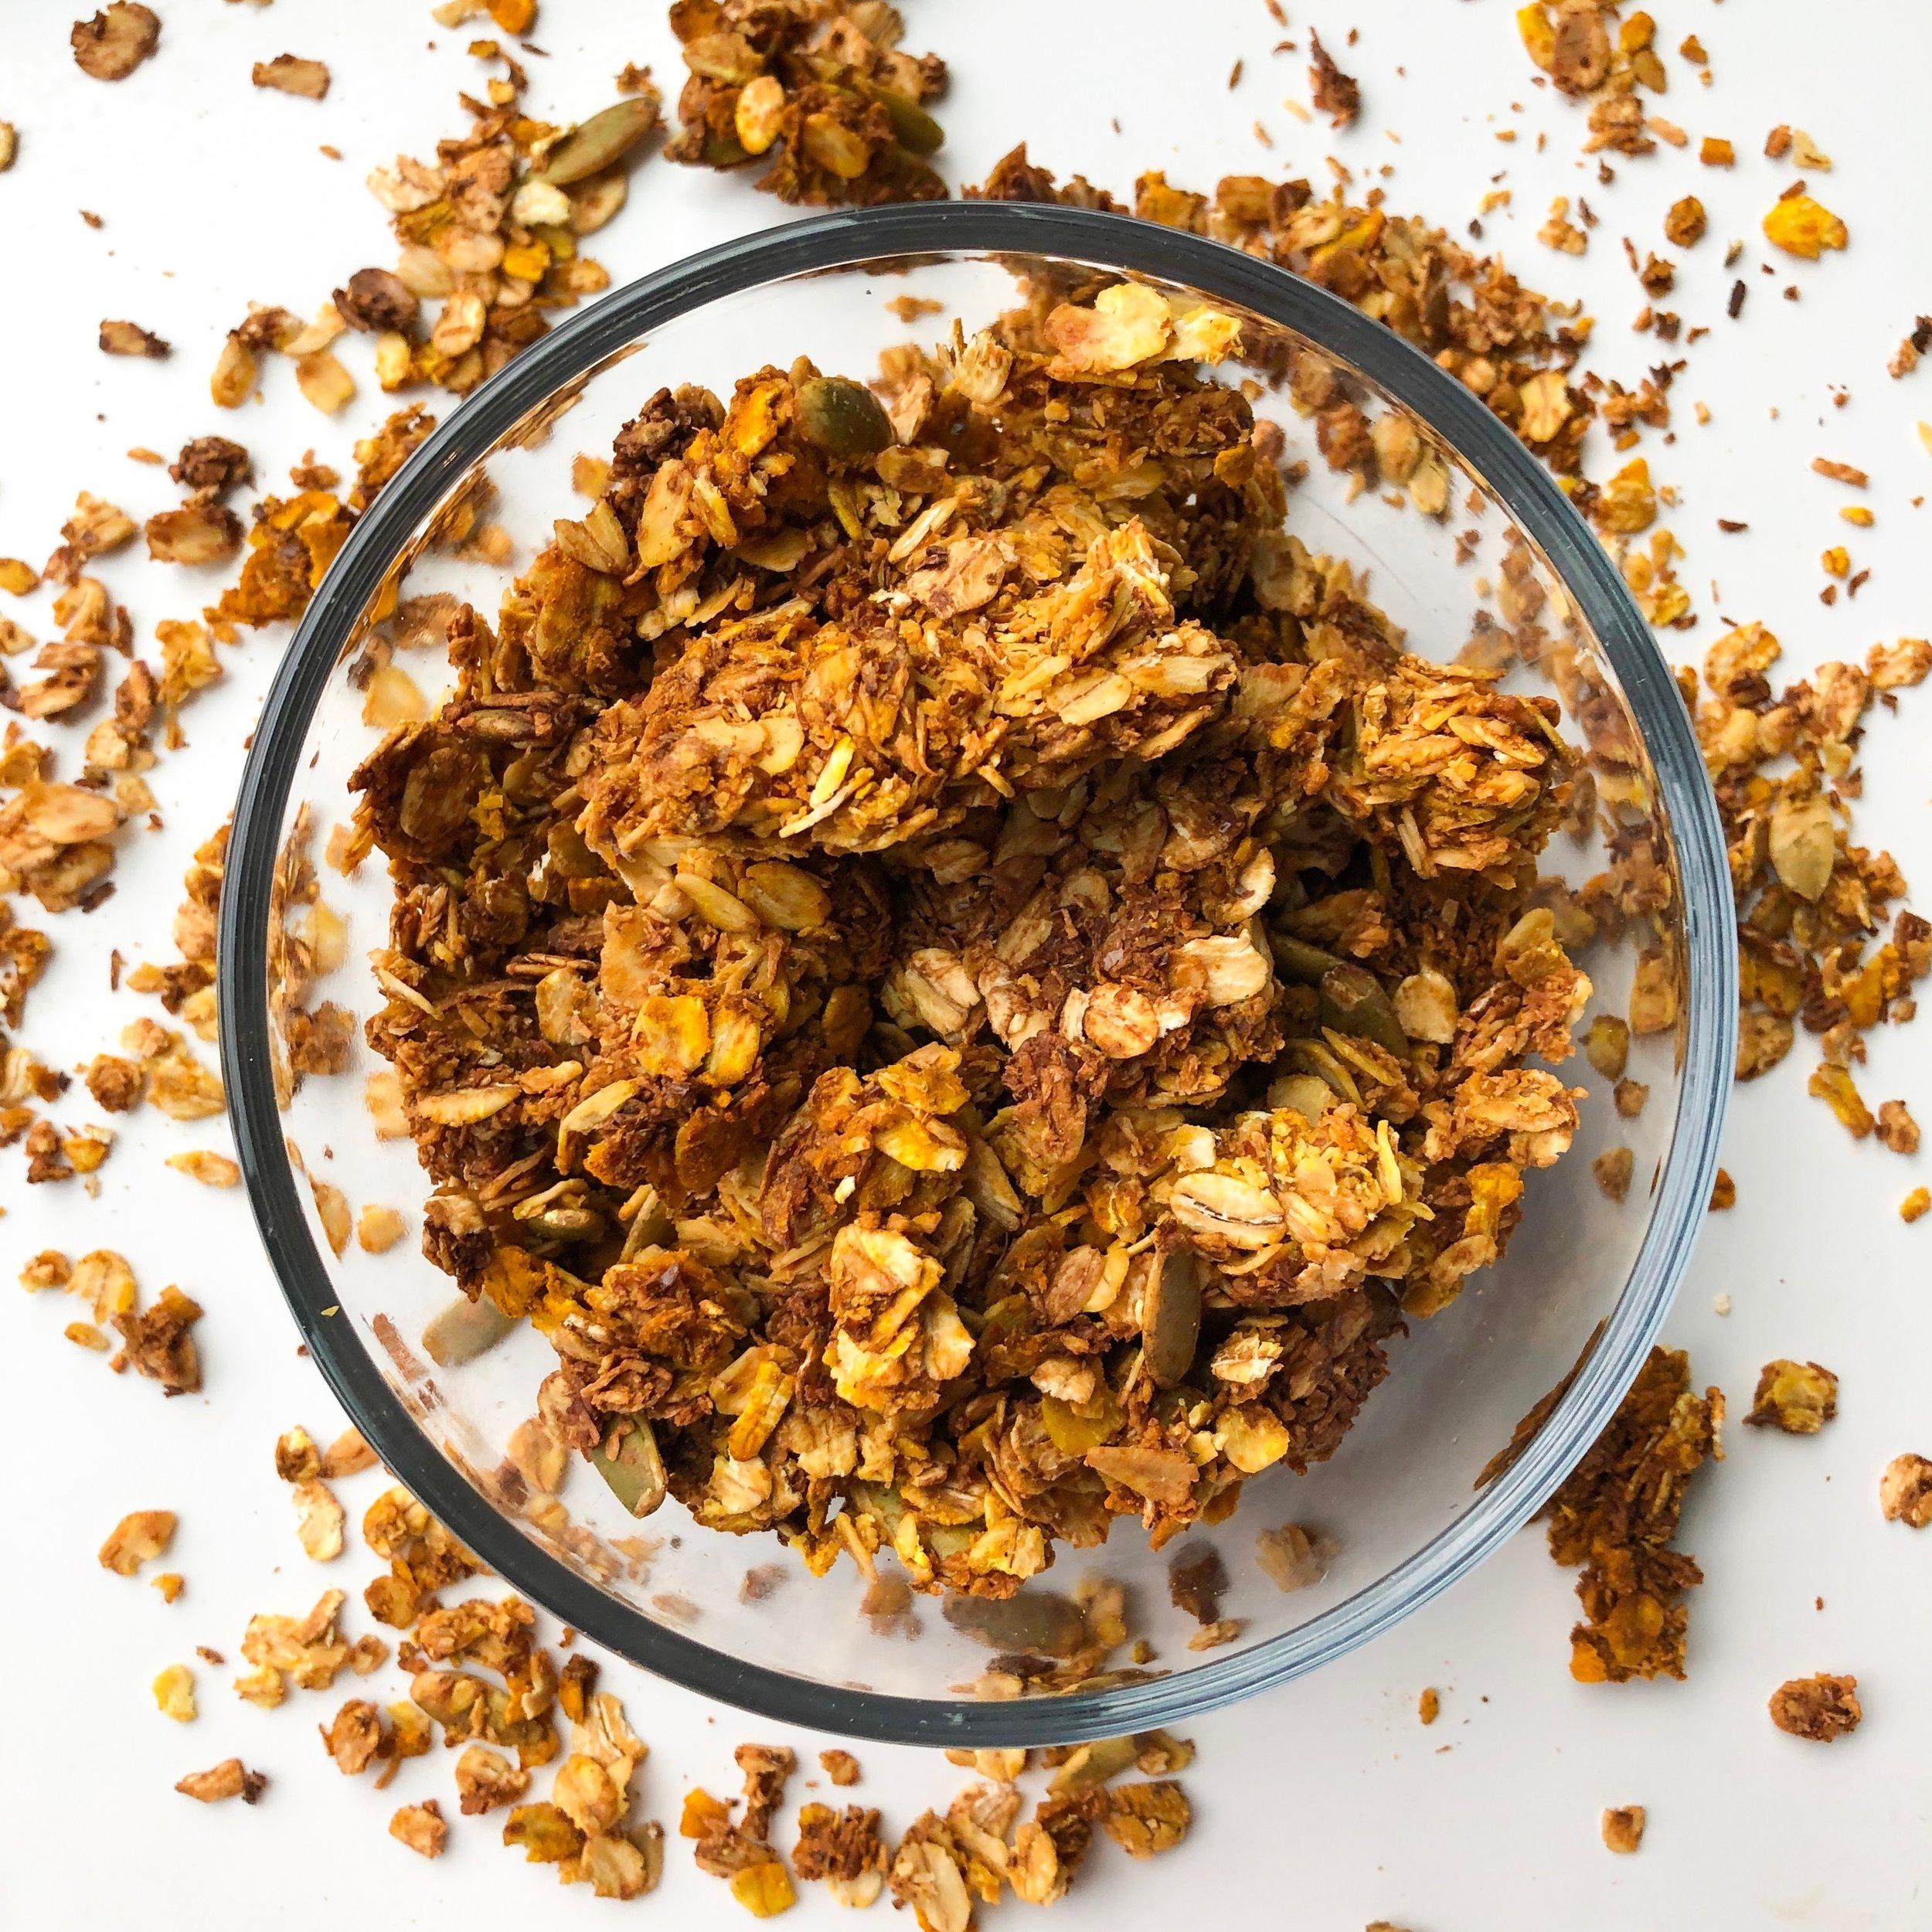 Golden-Coco Granola - DAIRY-FREE, NO ADDED SUGAR, GLUTEN-FREE (OPTIONAL), VEGAN (OPTIONAL), SUPERFOODS